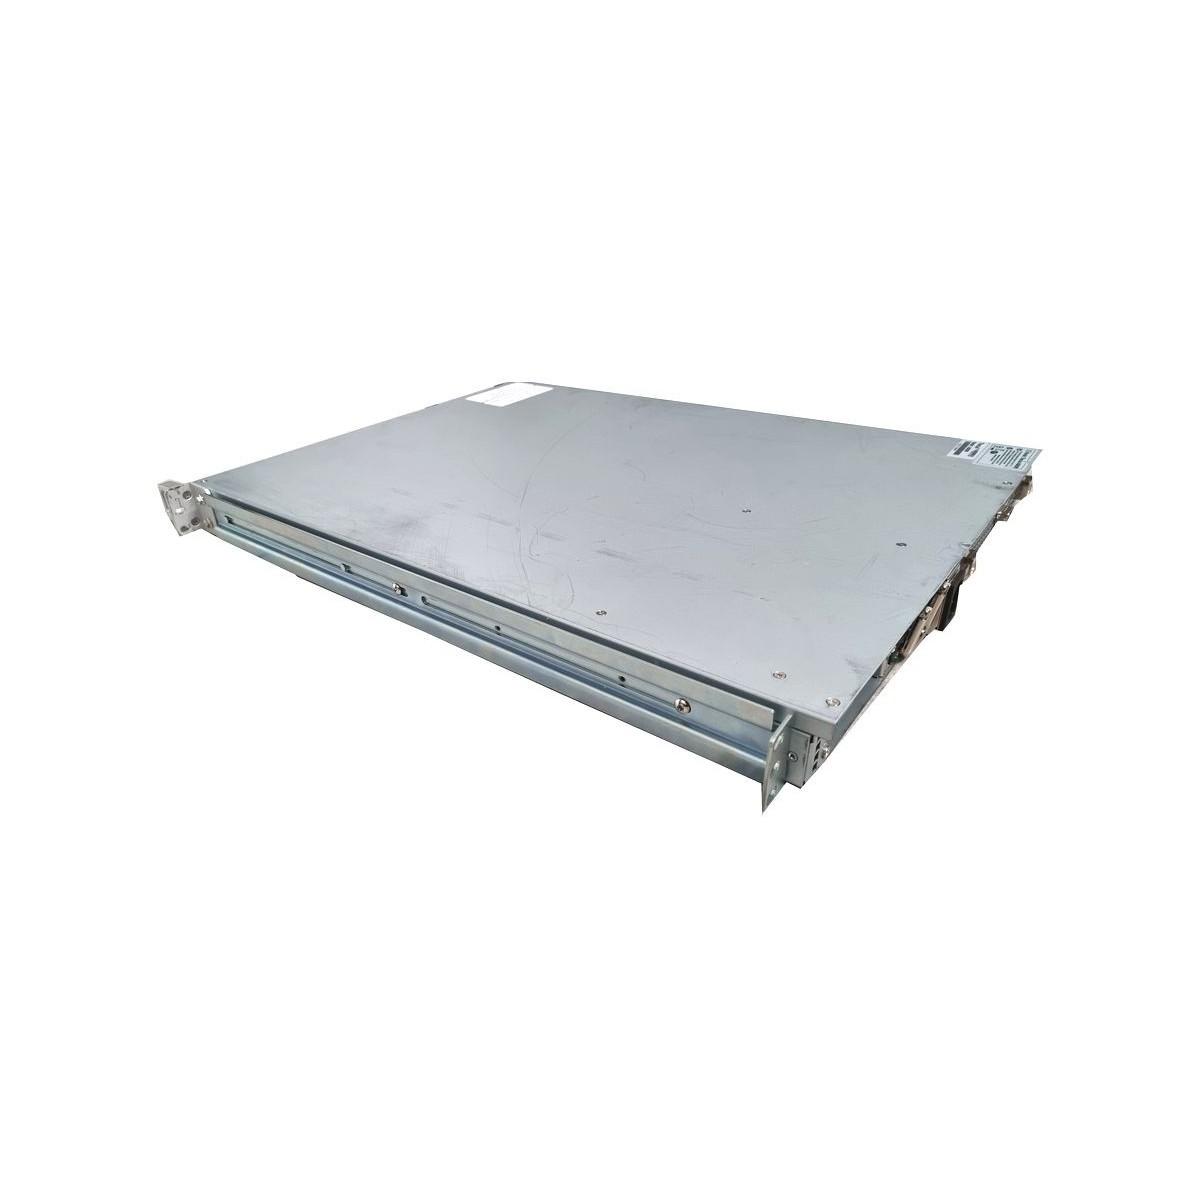 FUJITSU MR SCSI320-2X 256MB BAT S26361-F3090-E256